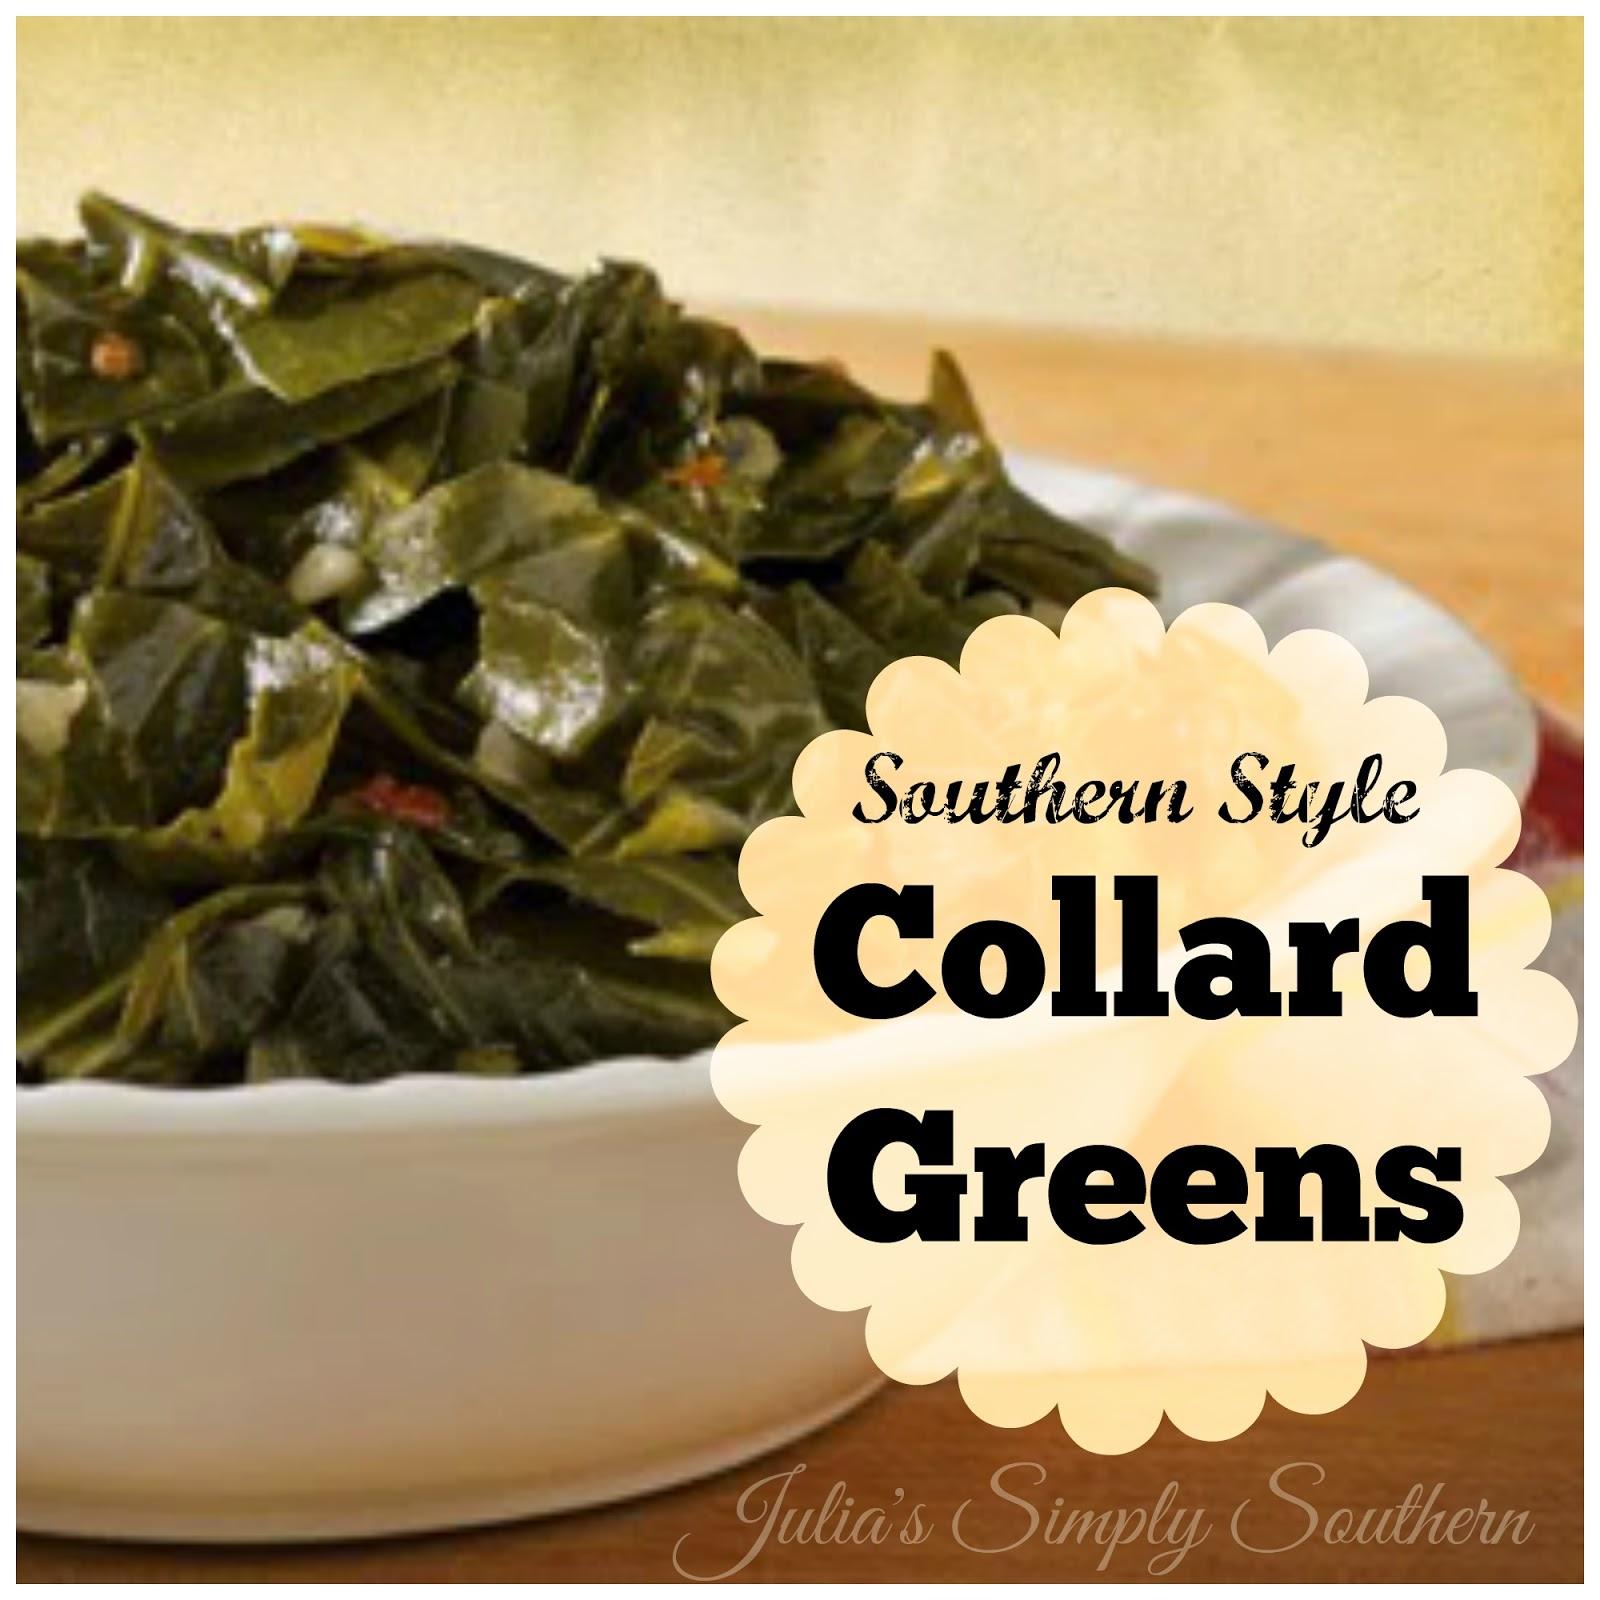 Julia's Simply Southern: Southern Style Collard Greens